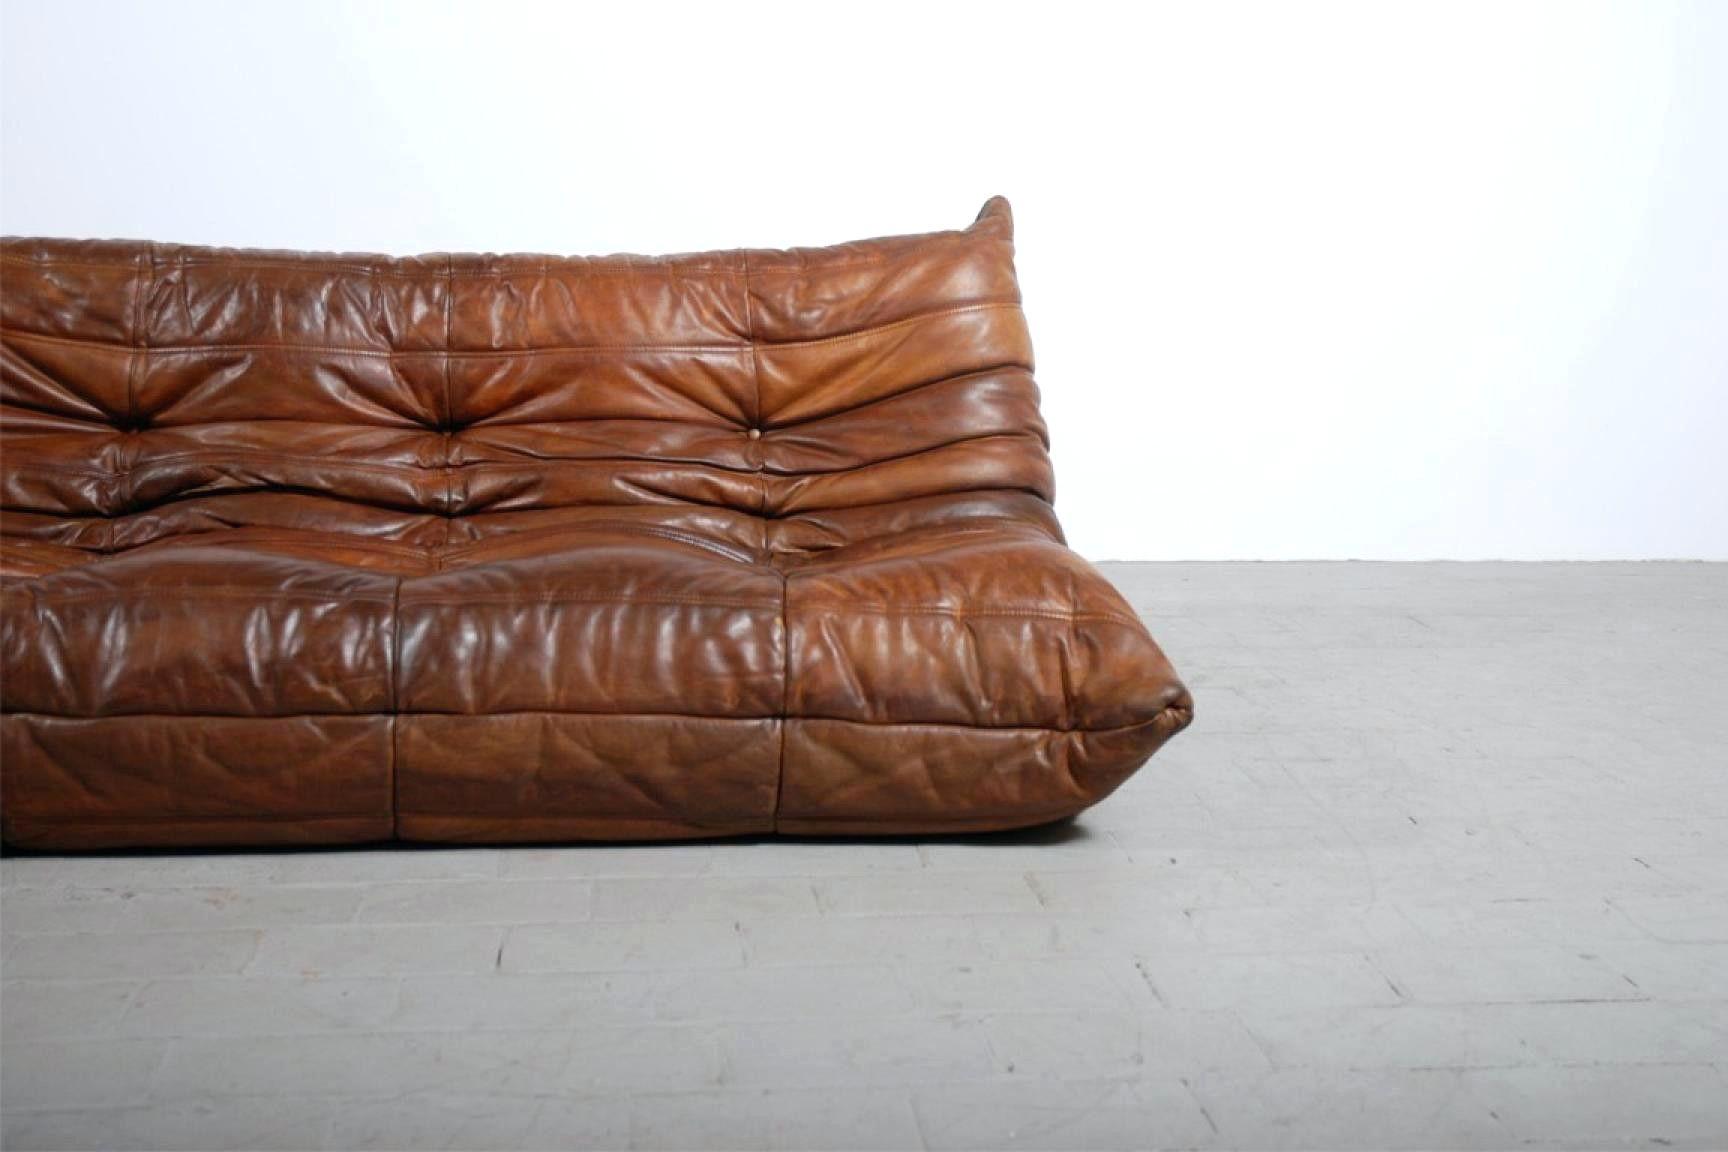 Fauteuil le bon coin fauteuil ancien le bon coin fauteuil ancien